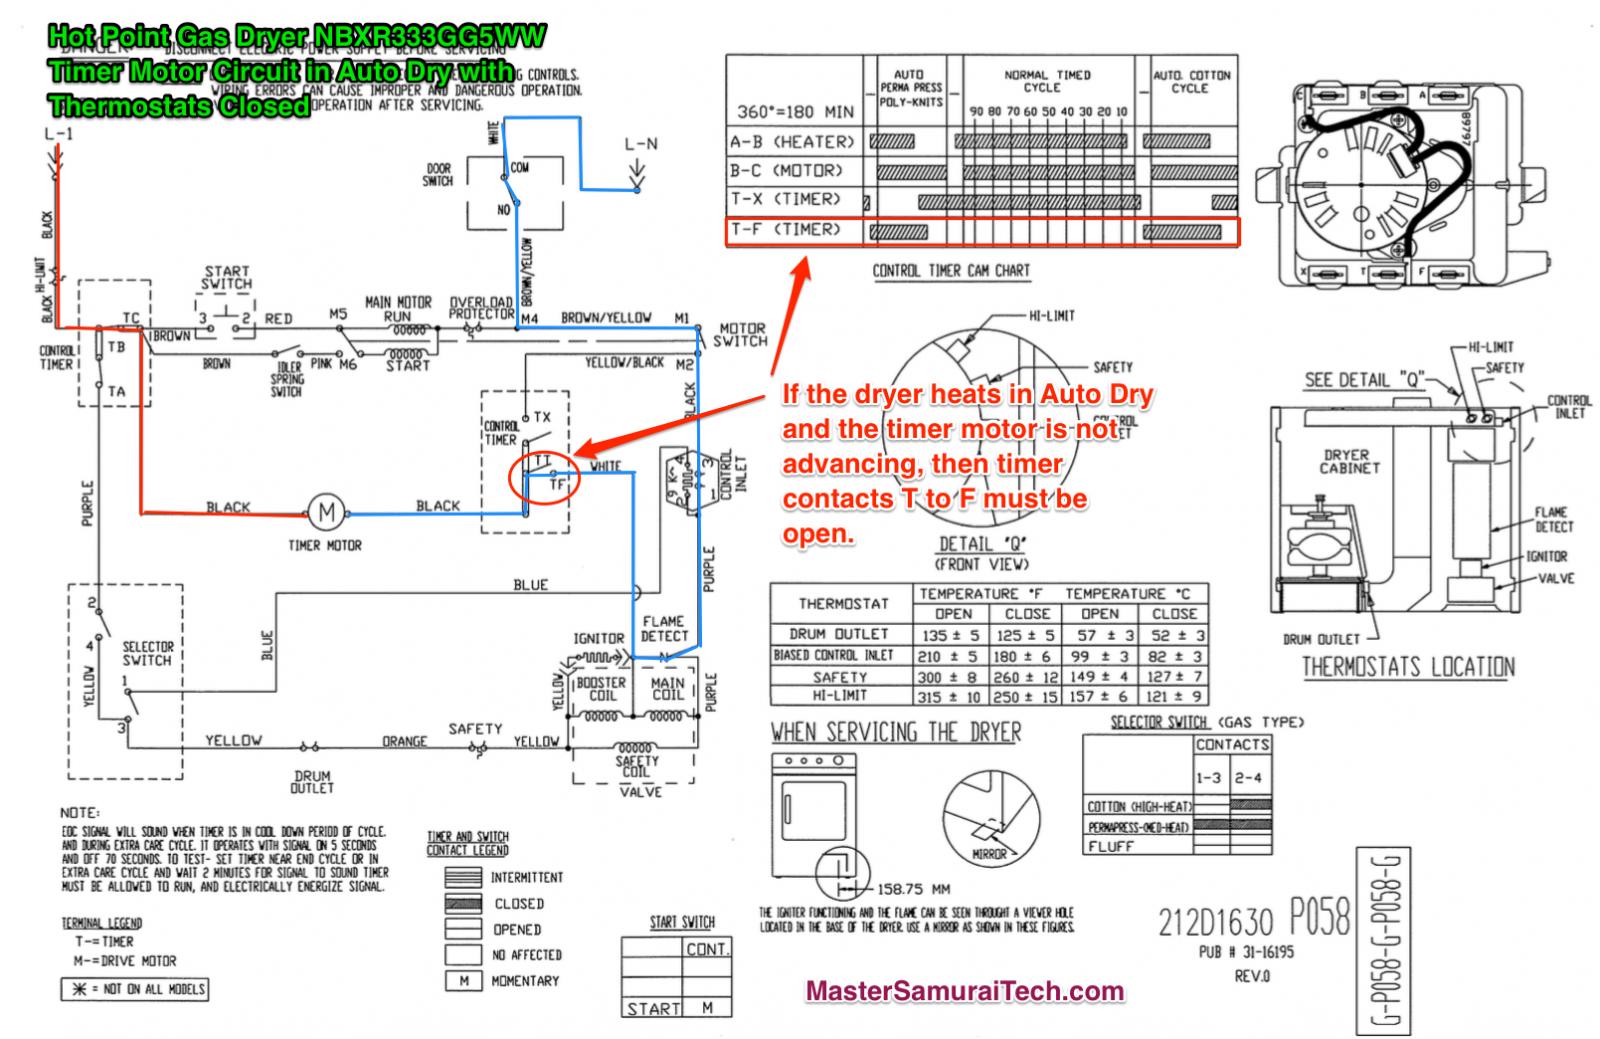 Dexter Dryer Motor Wiring Diagram Diagrams Whirlpool Schematic Huebsch For Electrolux Shop Fan Bosch